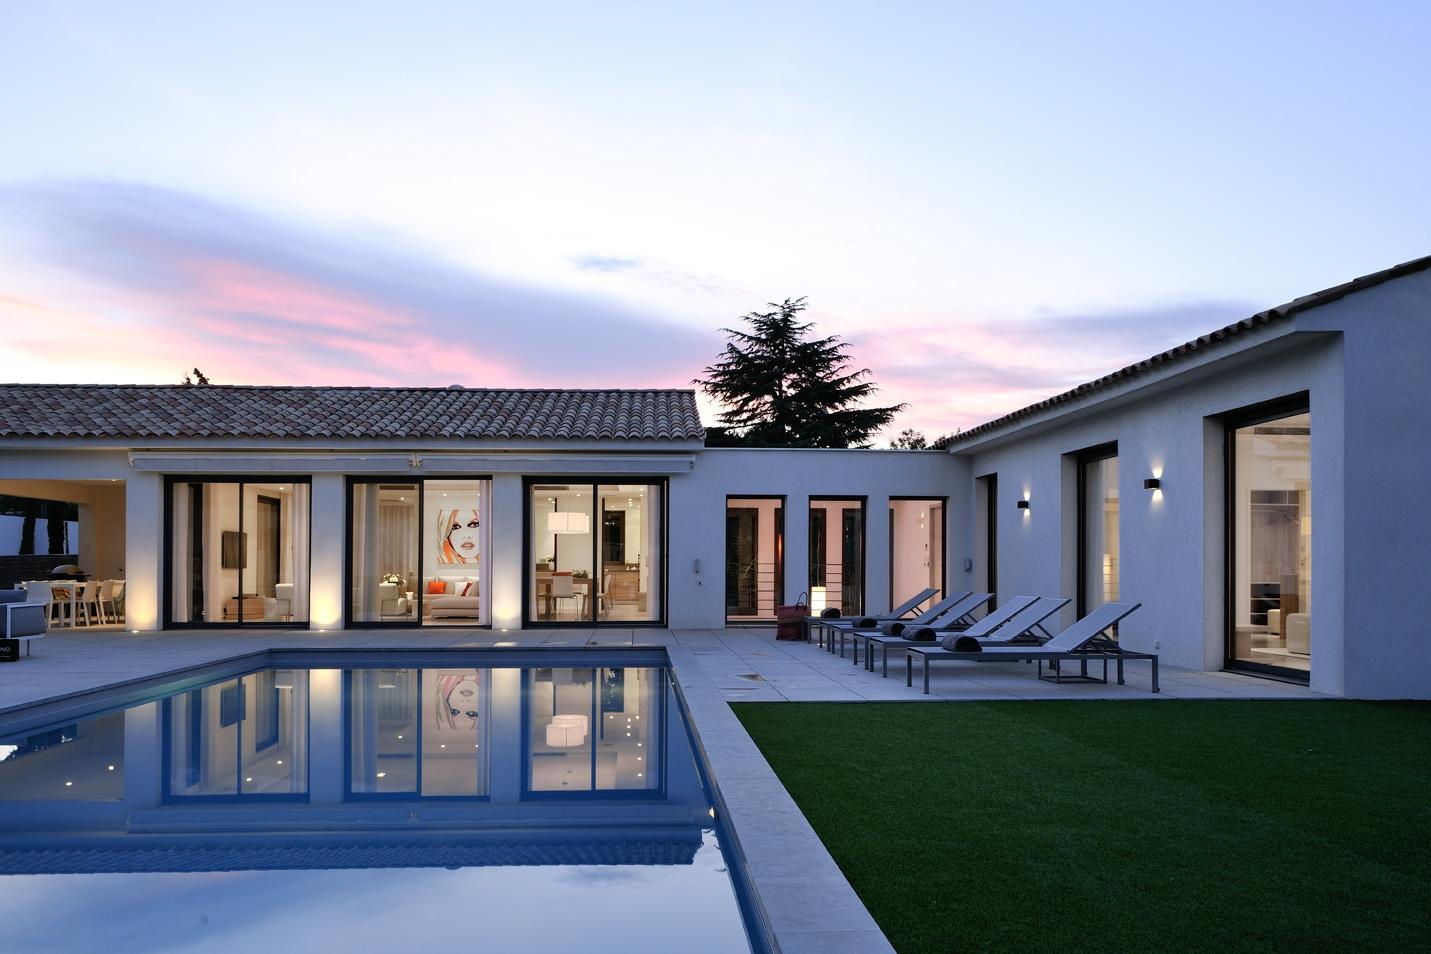 4 stunning sunny properties near the beach 24 02 2017 - Interieur maison contemporaine architecte ...